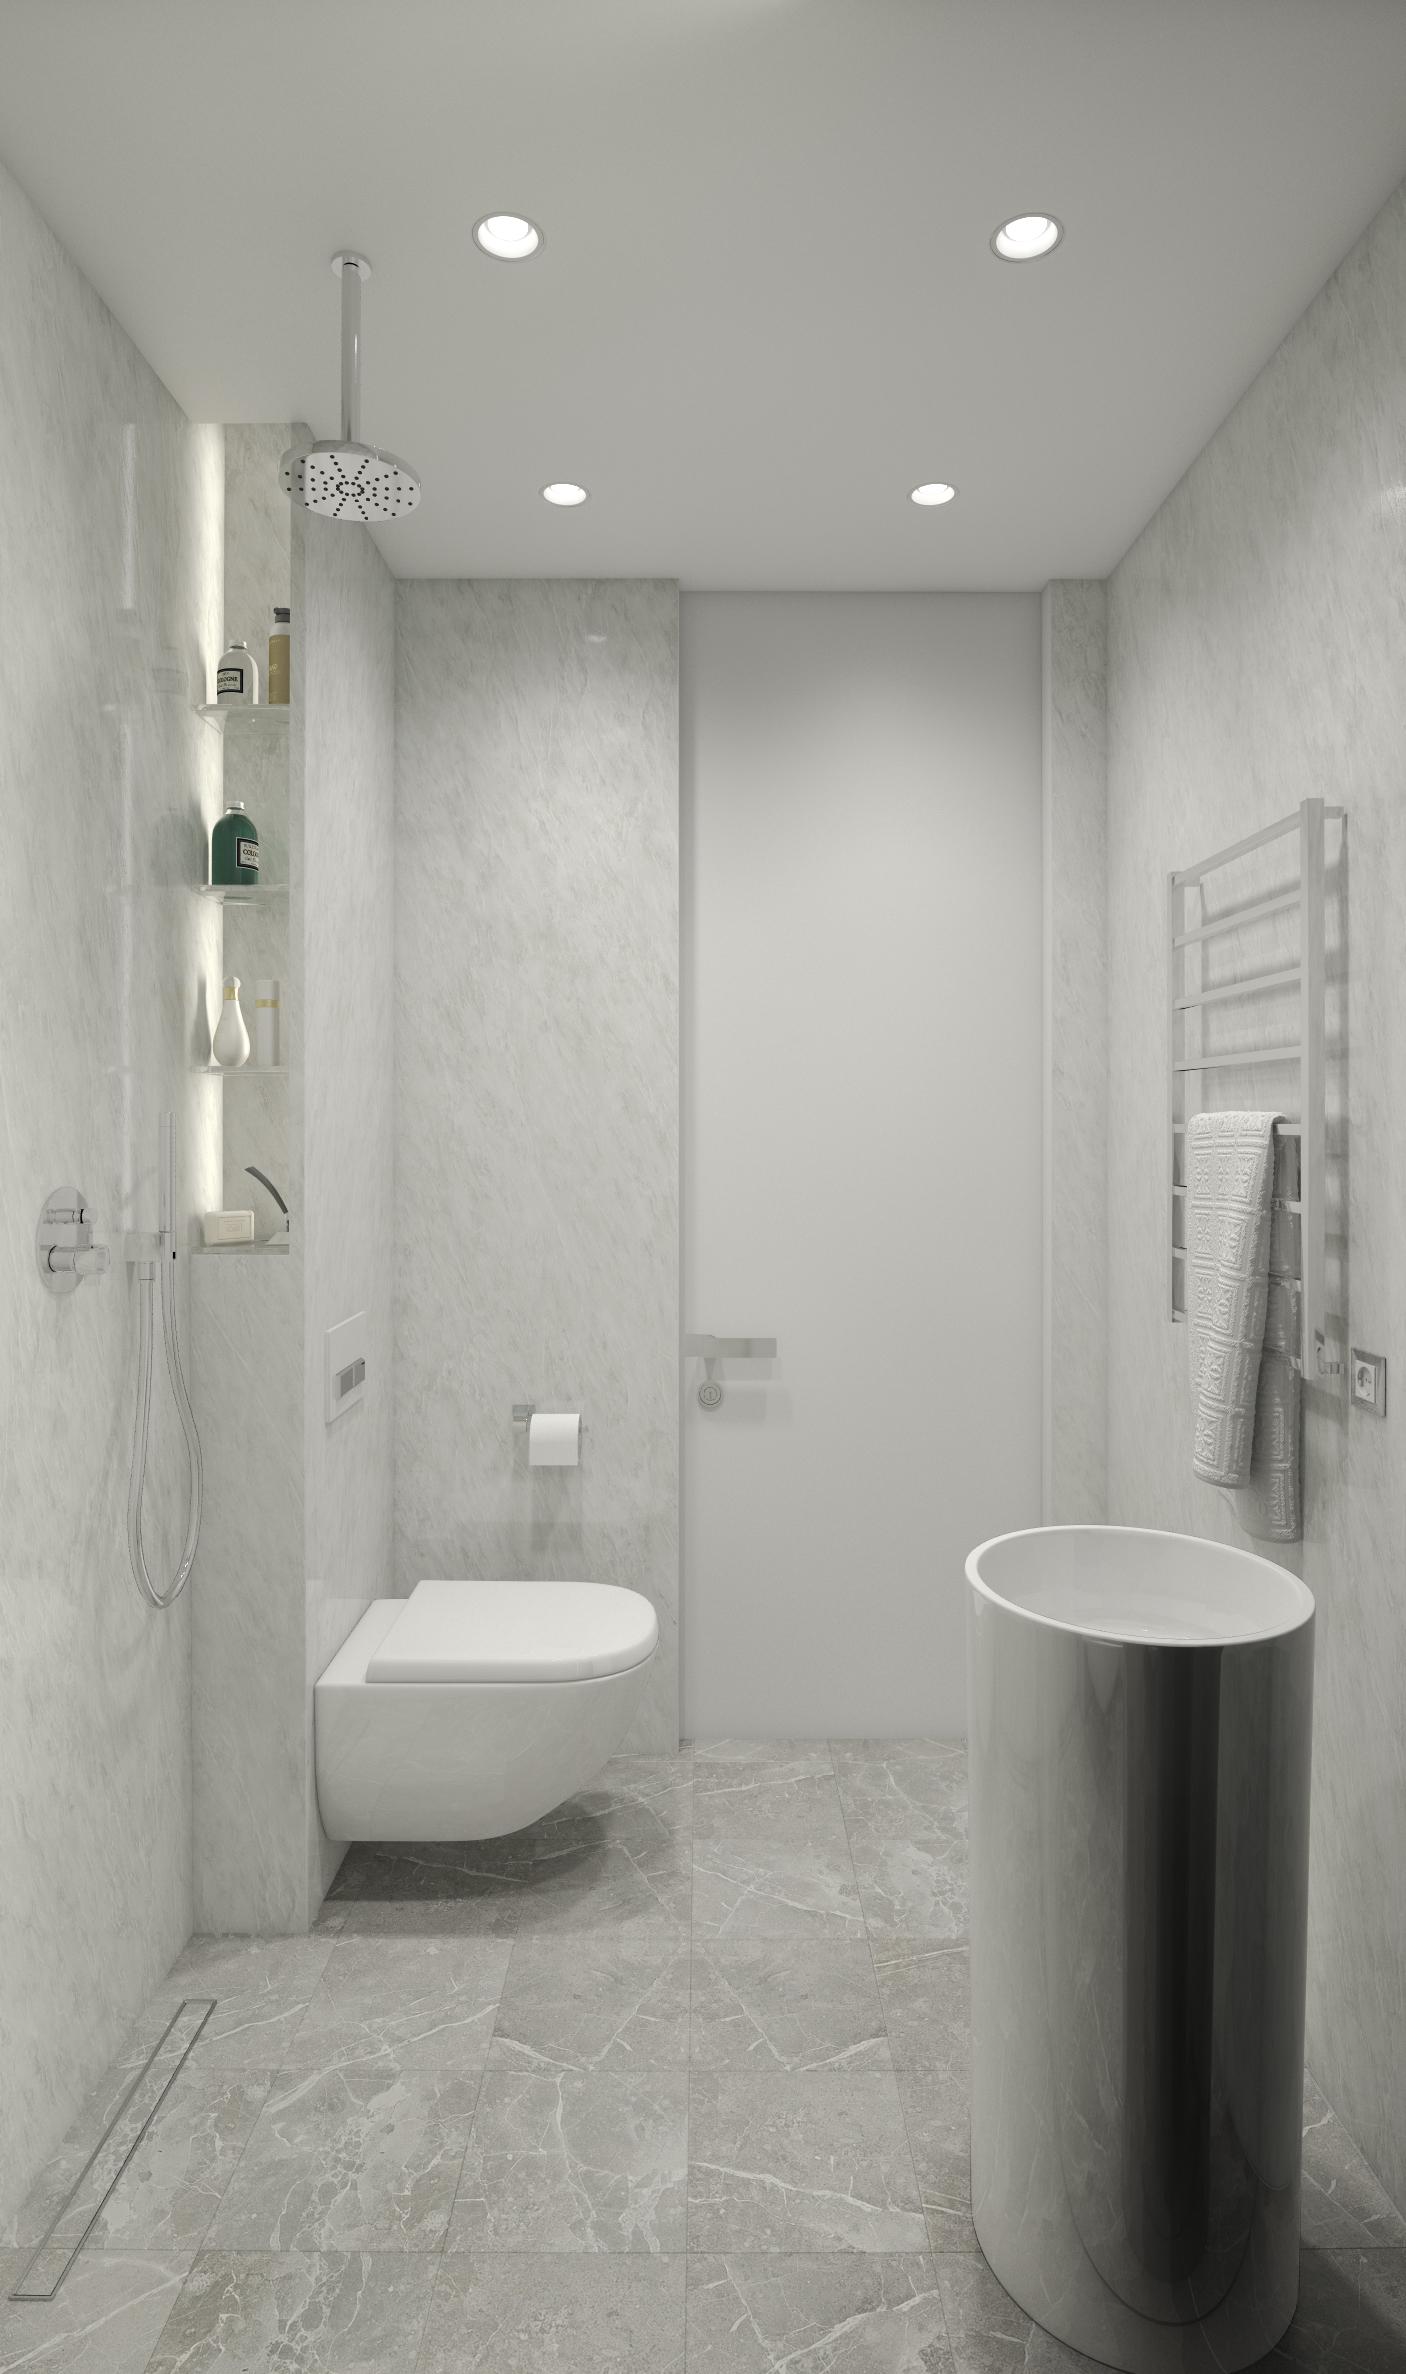 Showerroom_view_03-2